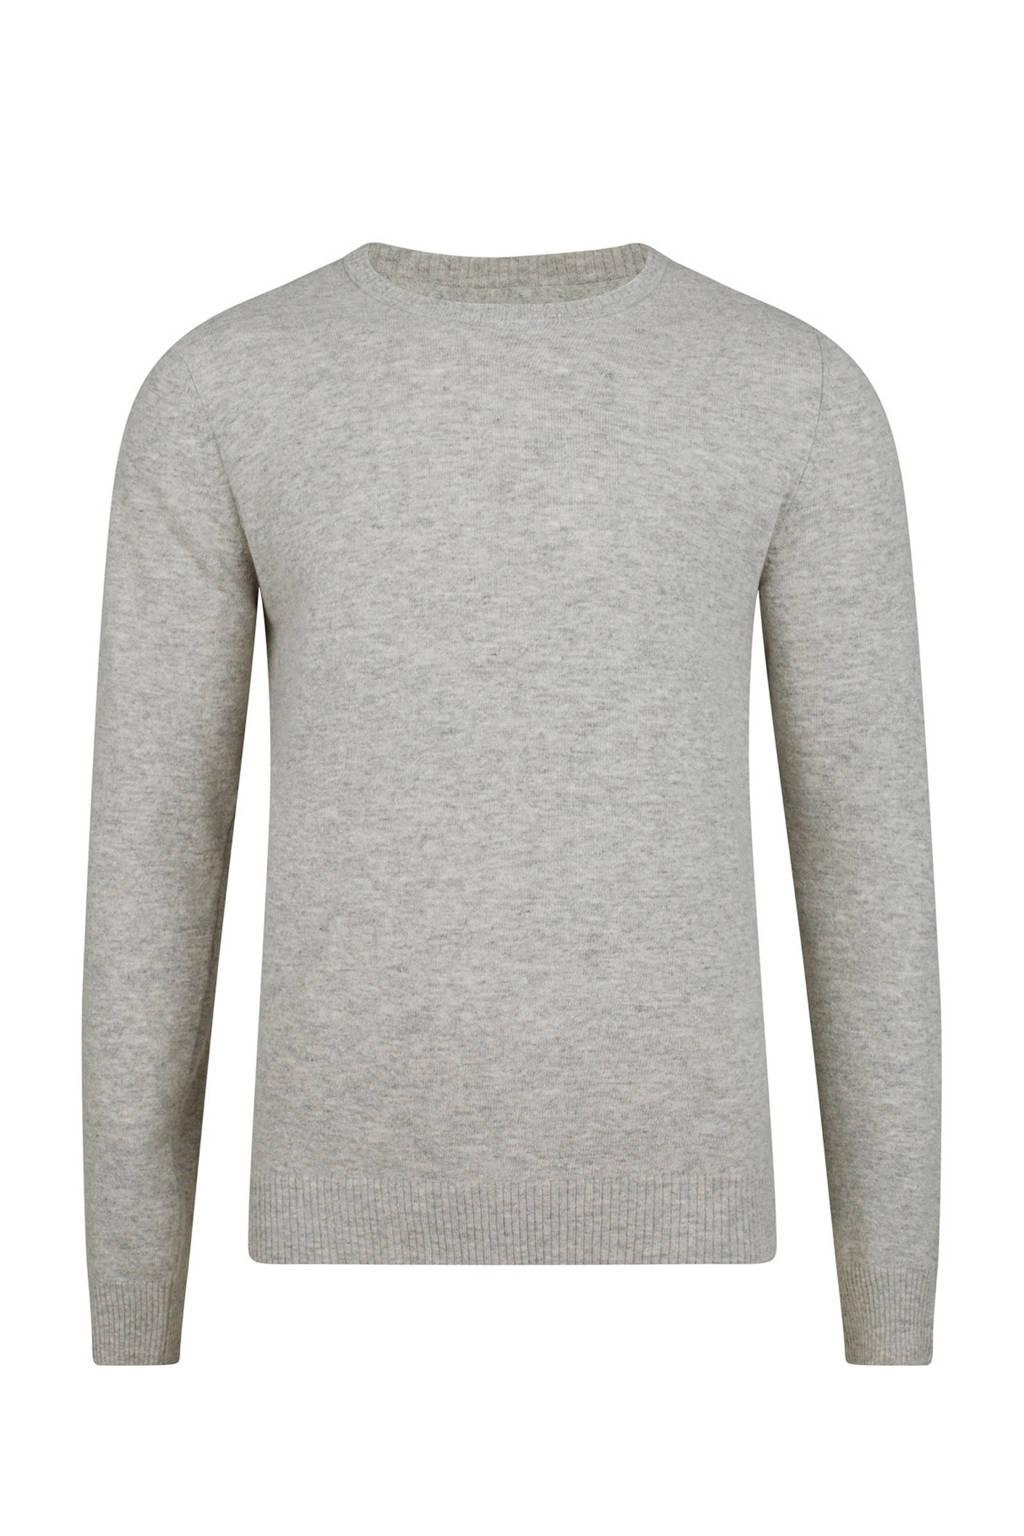 61377efdac4 WE Fashion gemêleerde trui van lamswol grijs, Grijs melange